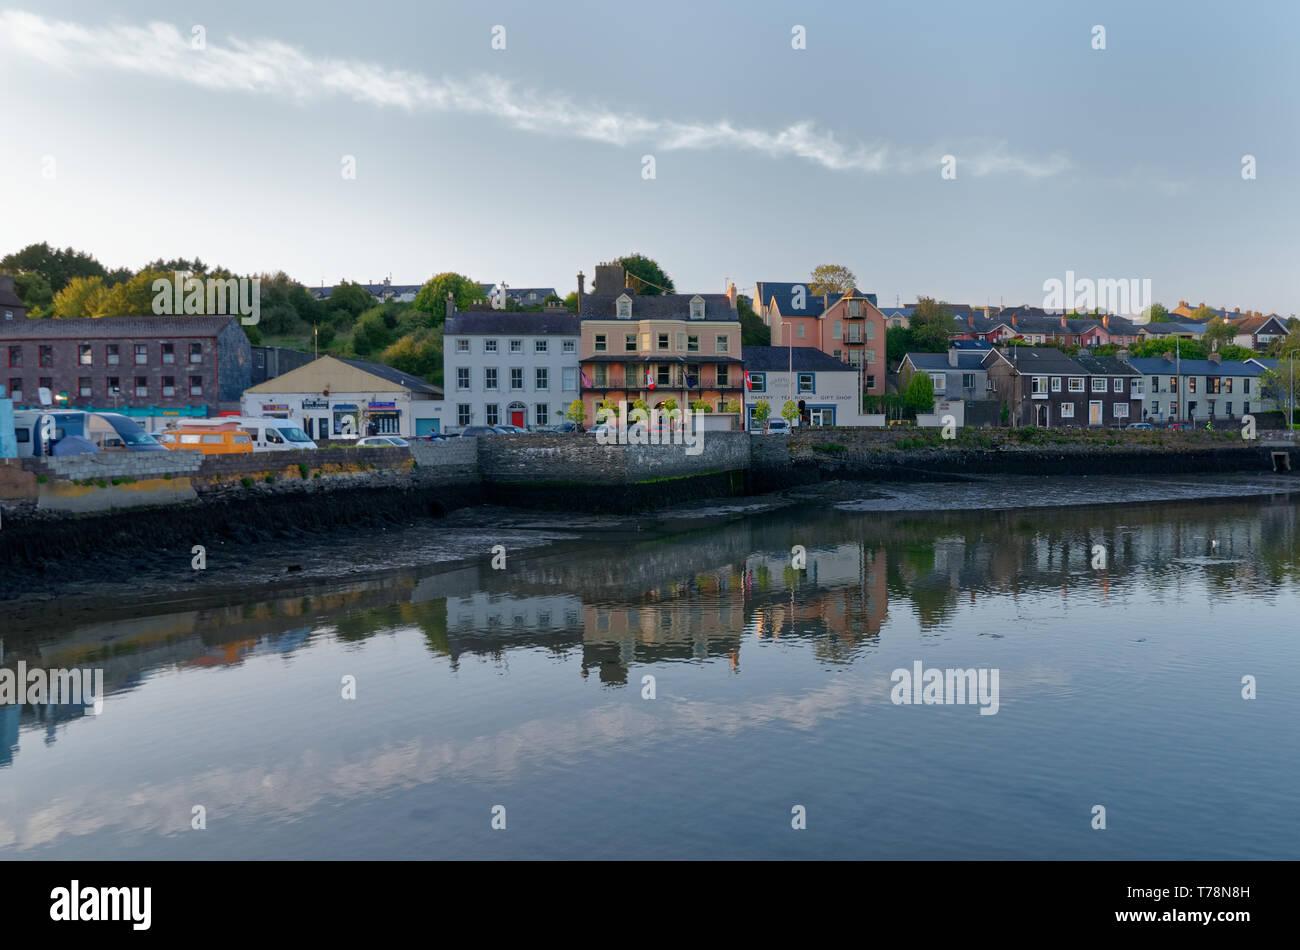 Digital content from: Irish Historic Towns Atlas - Amazon S3